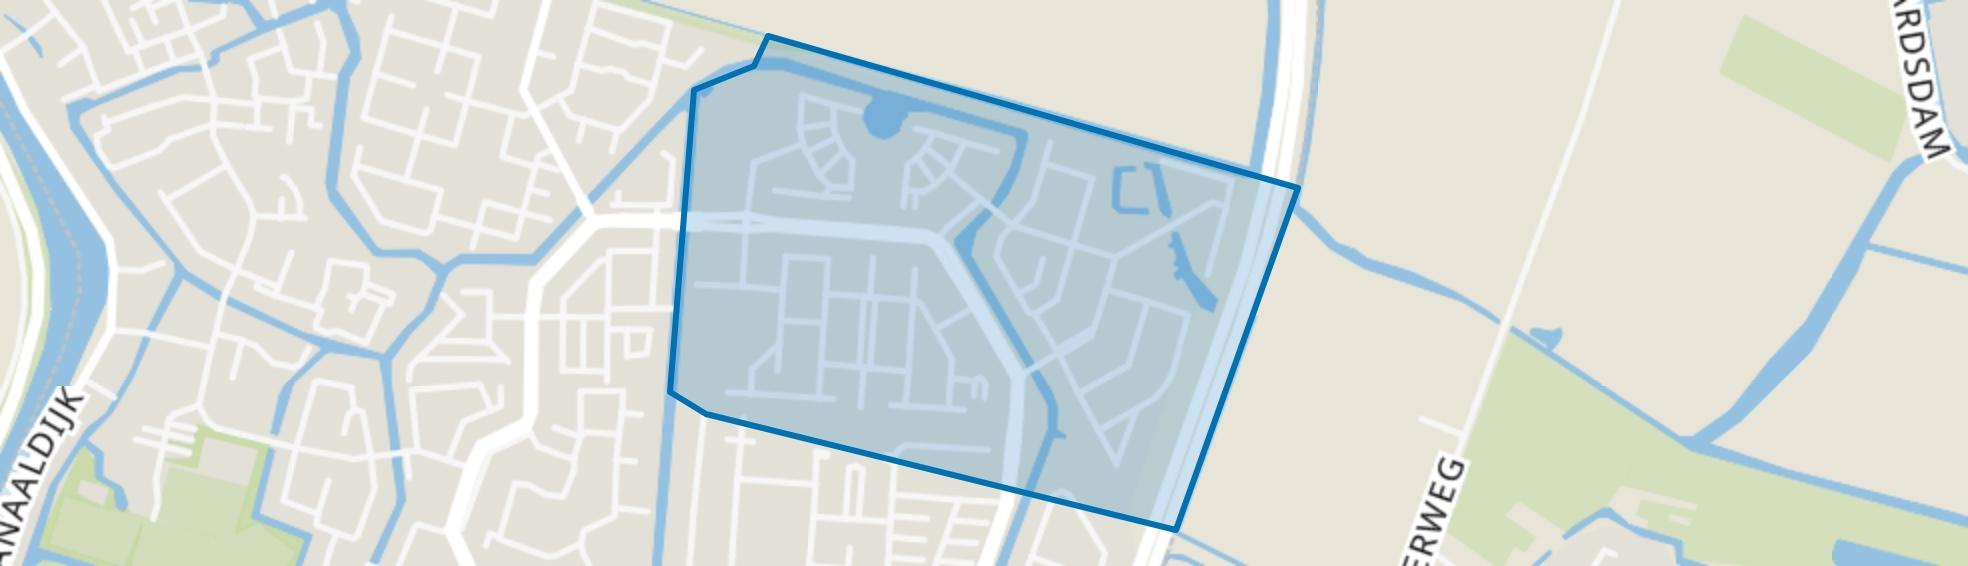 Daalmeer-Noordoost, Alkmaar map